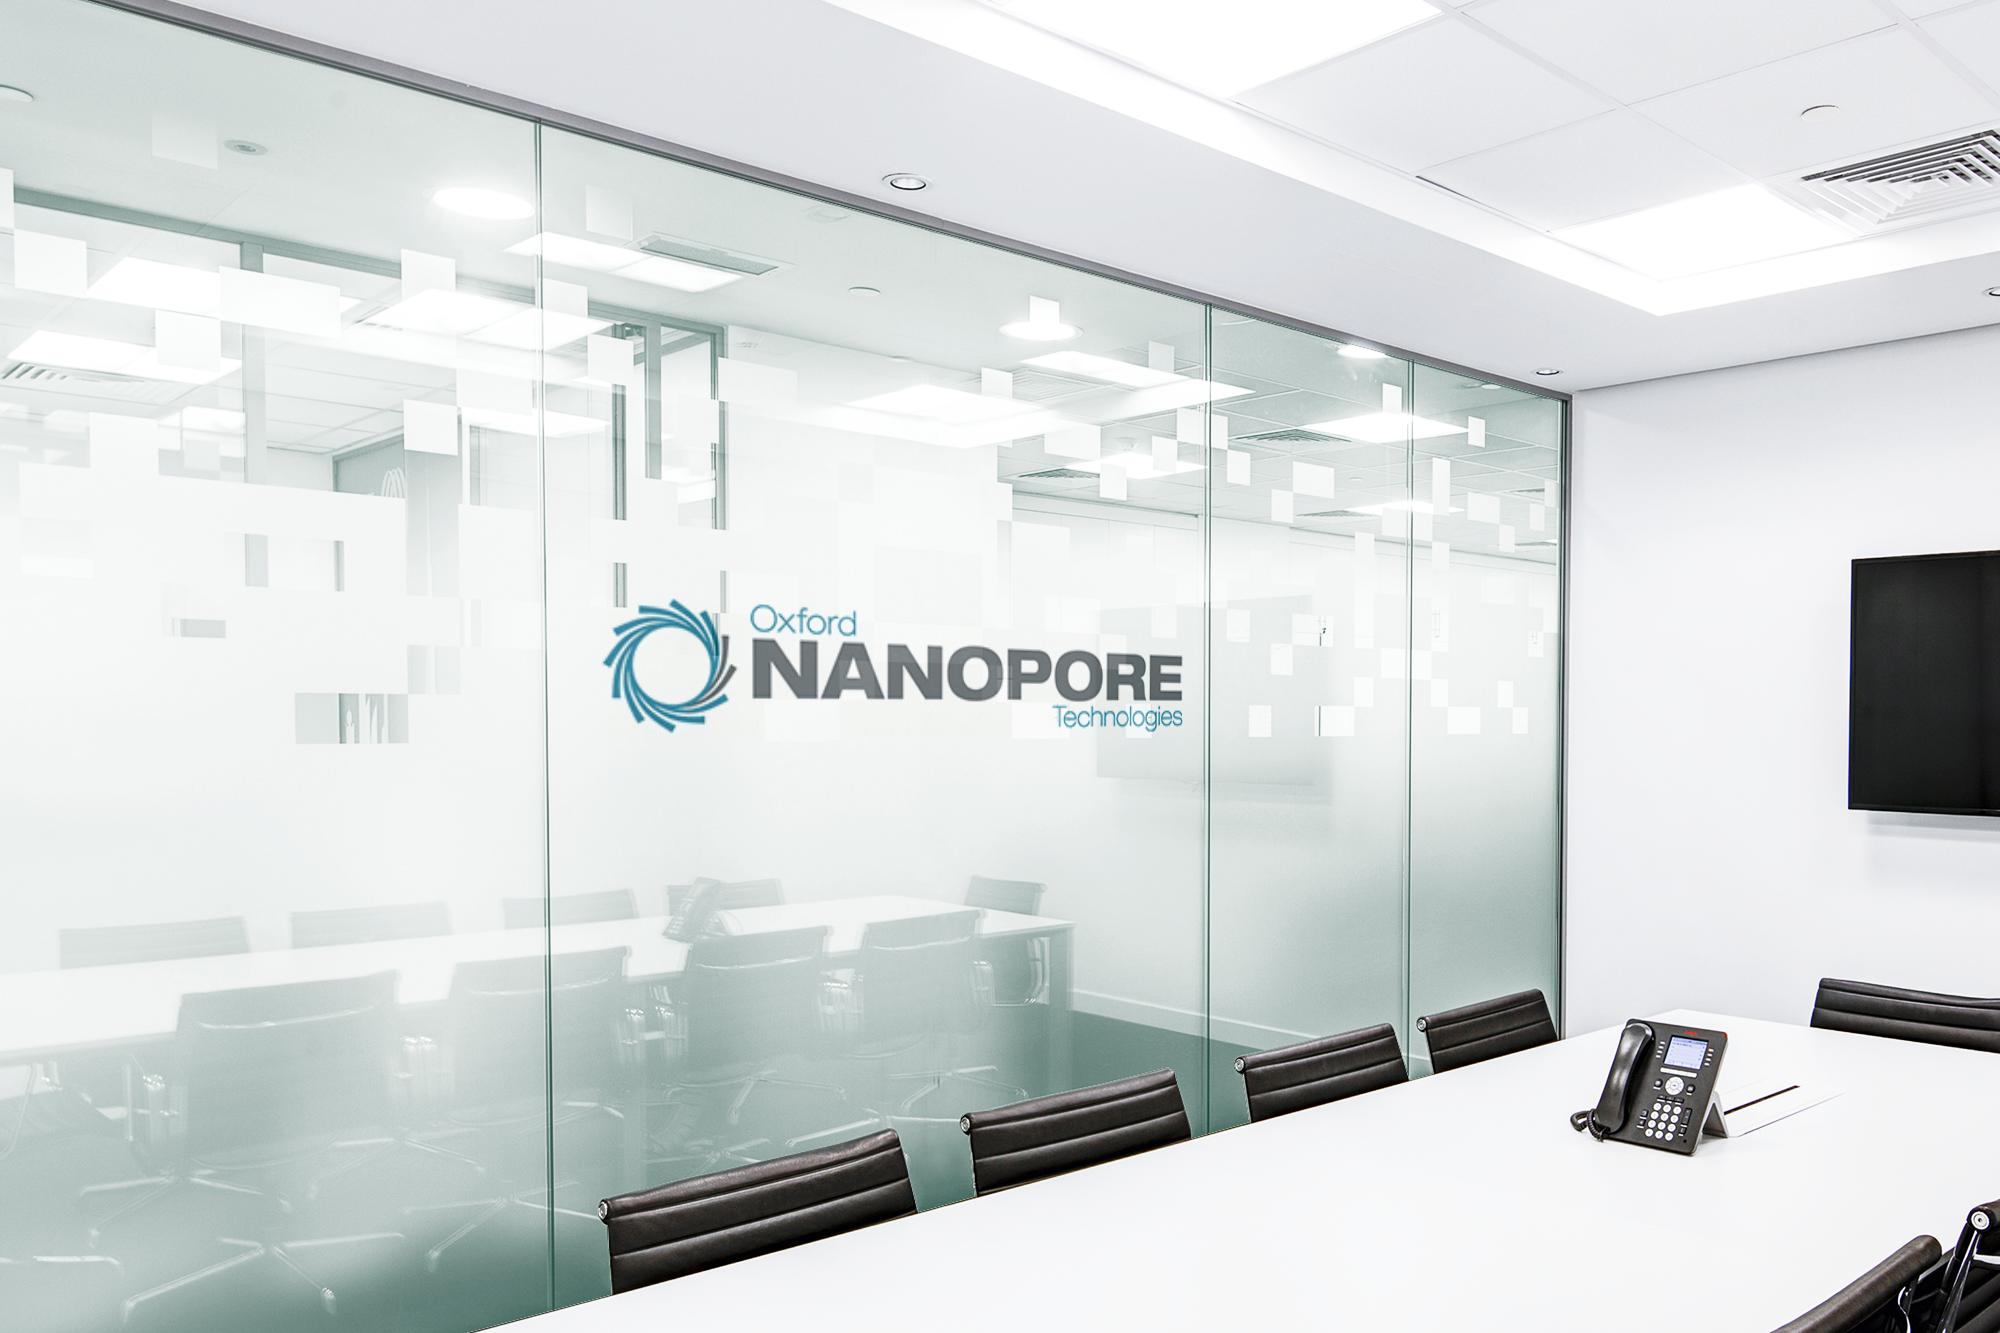 Oxford Nanopore Initial Public Offering